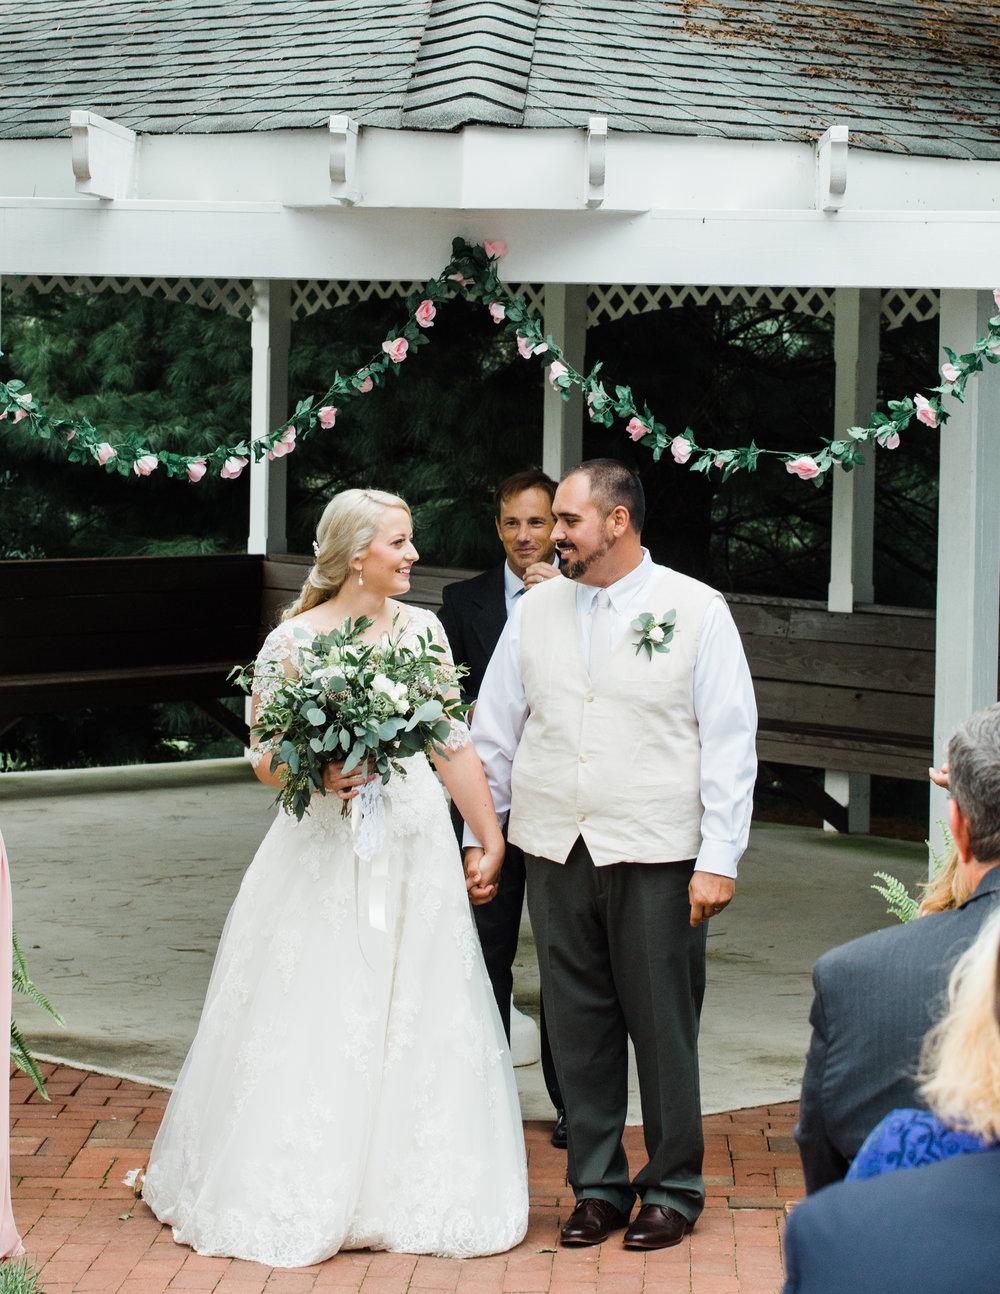 Fosters_WeddingBlog_84.jpg